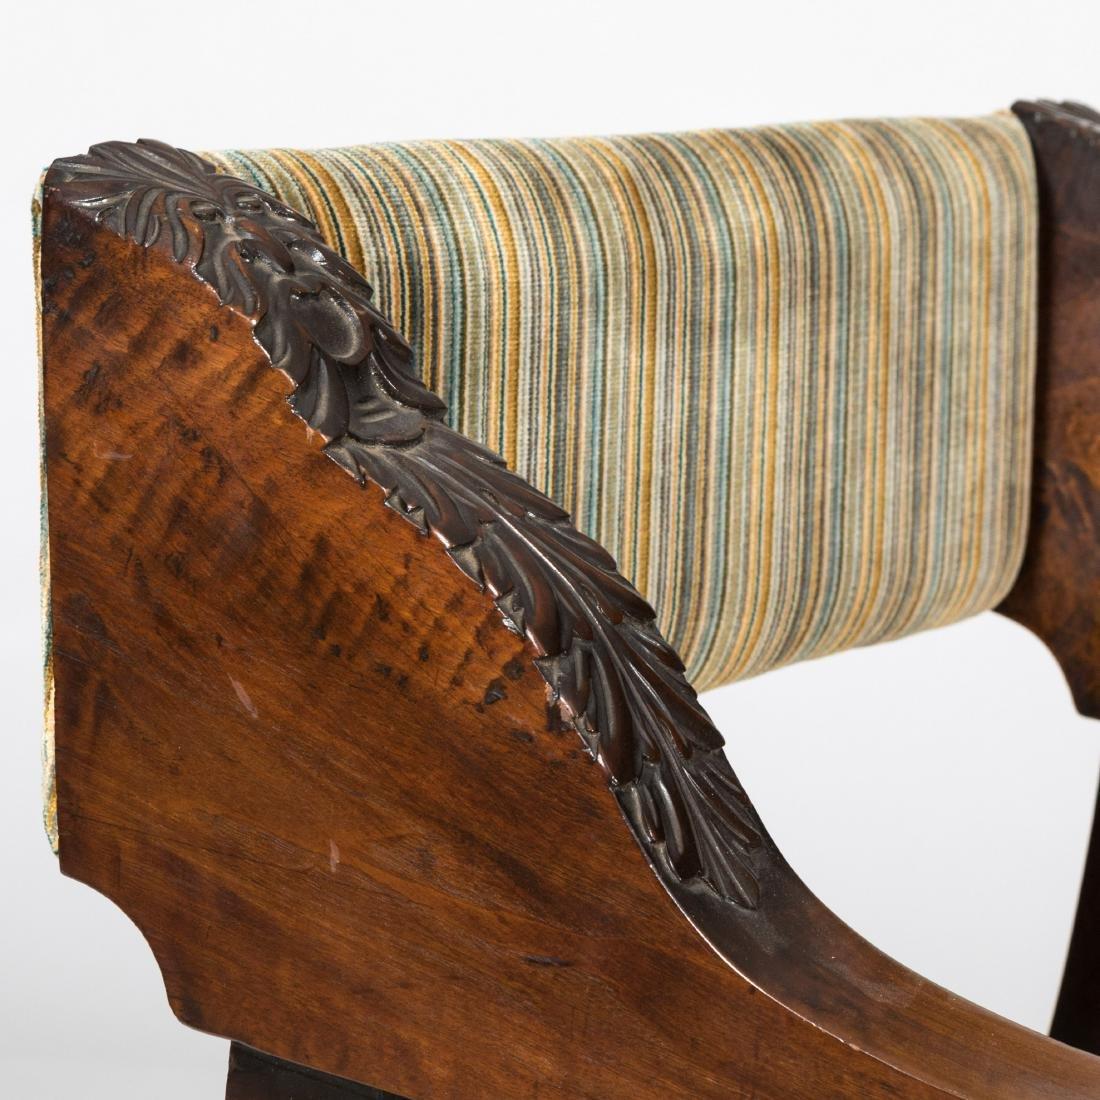 Figural Carved Savonarola Chair - 5